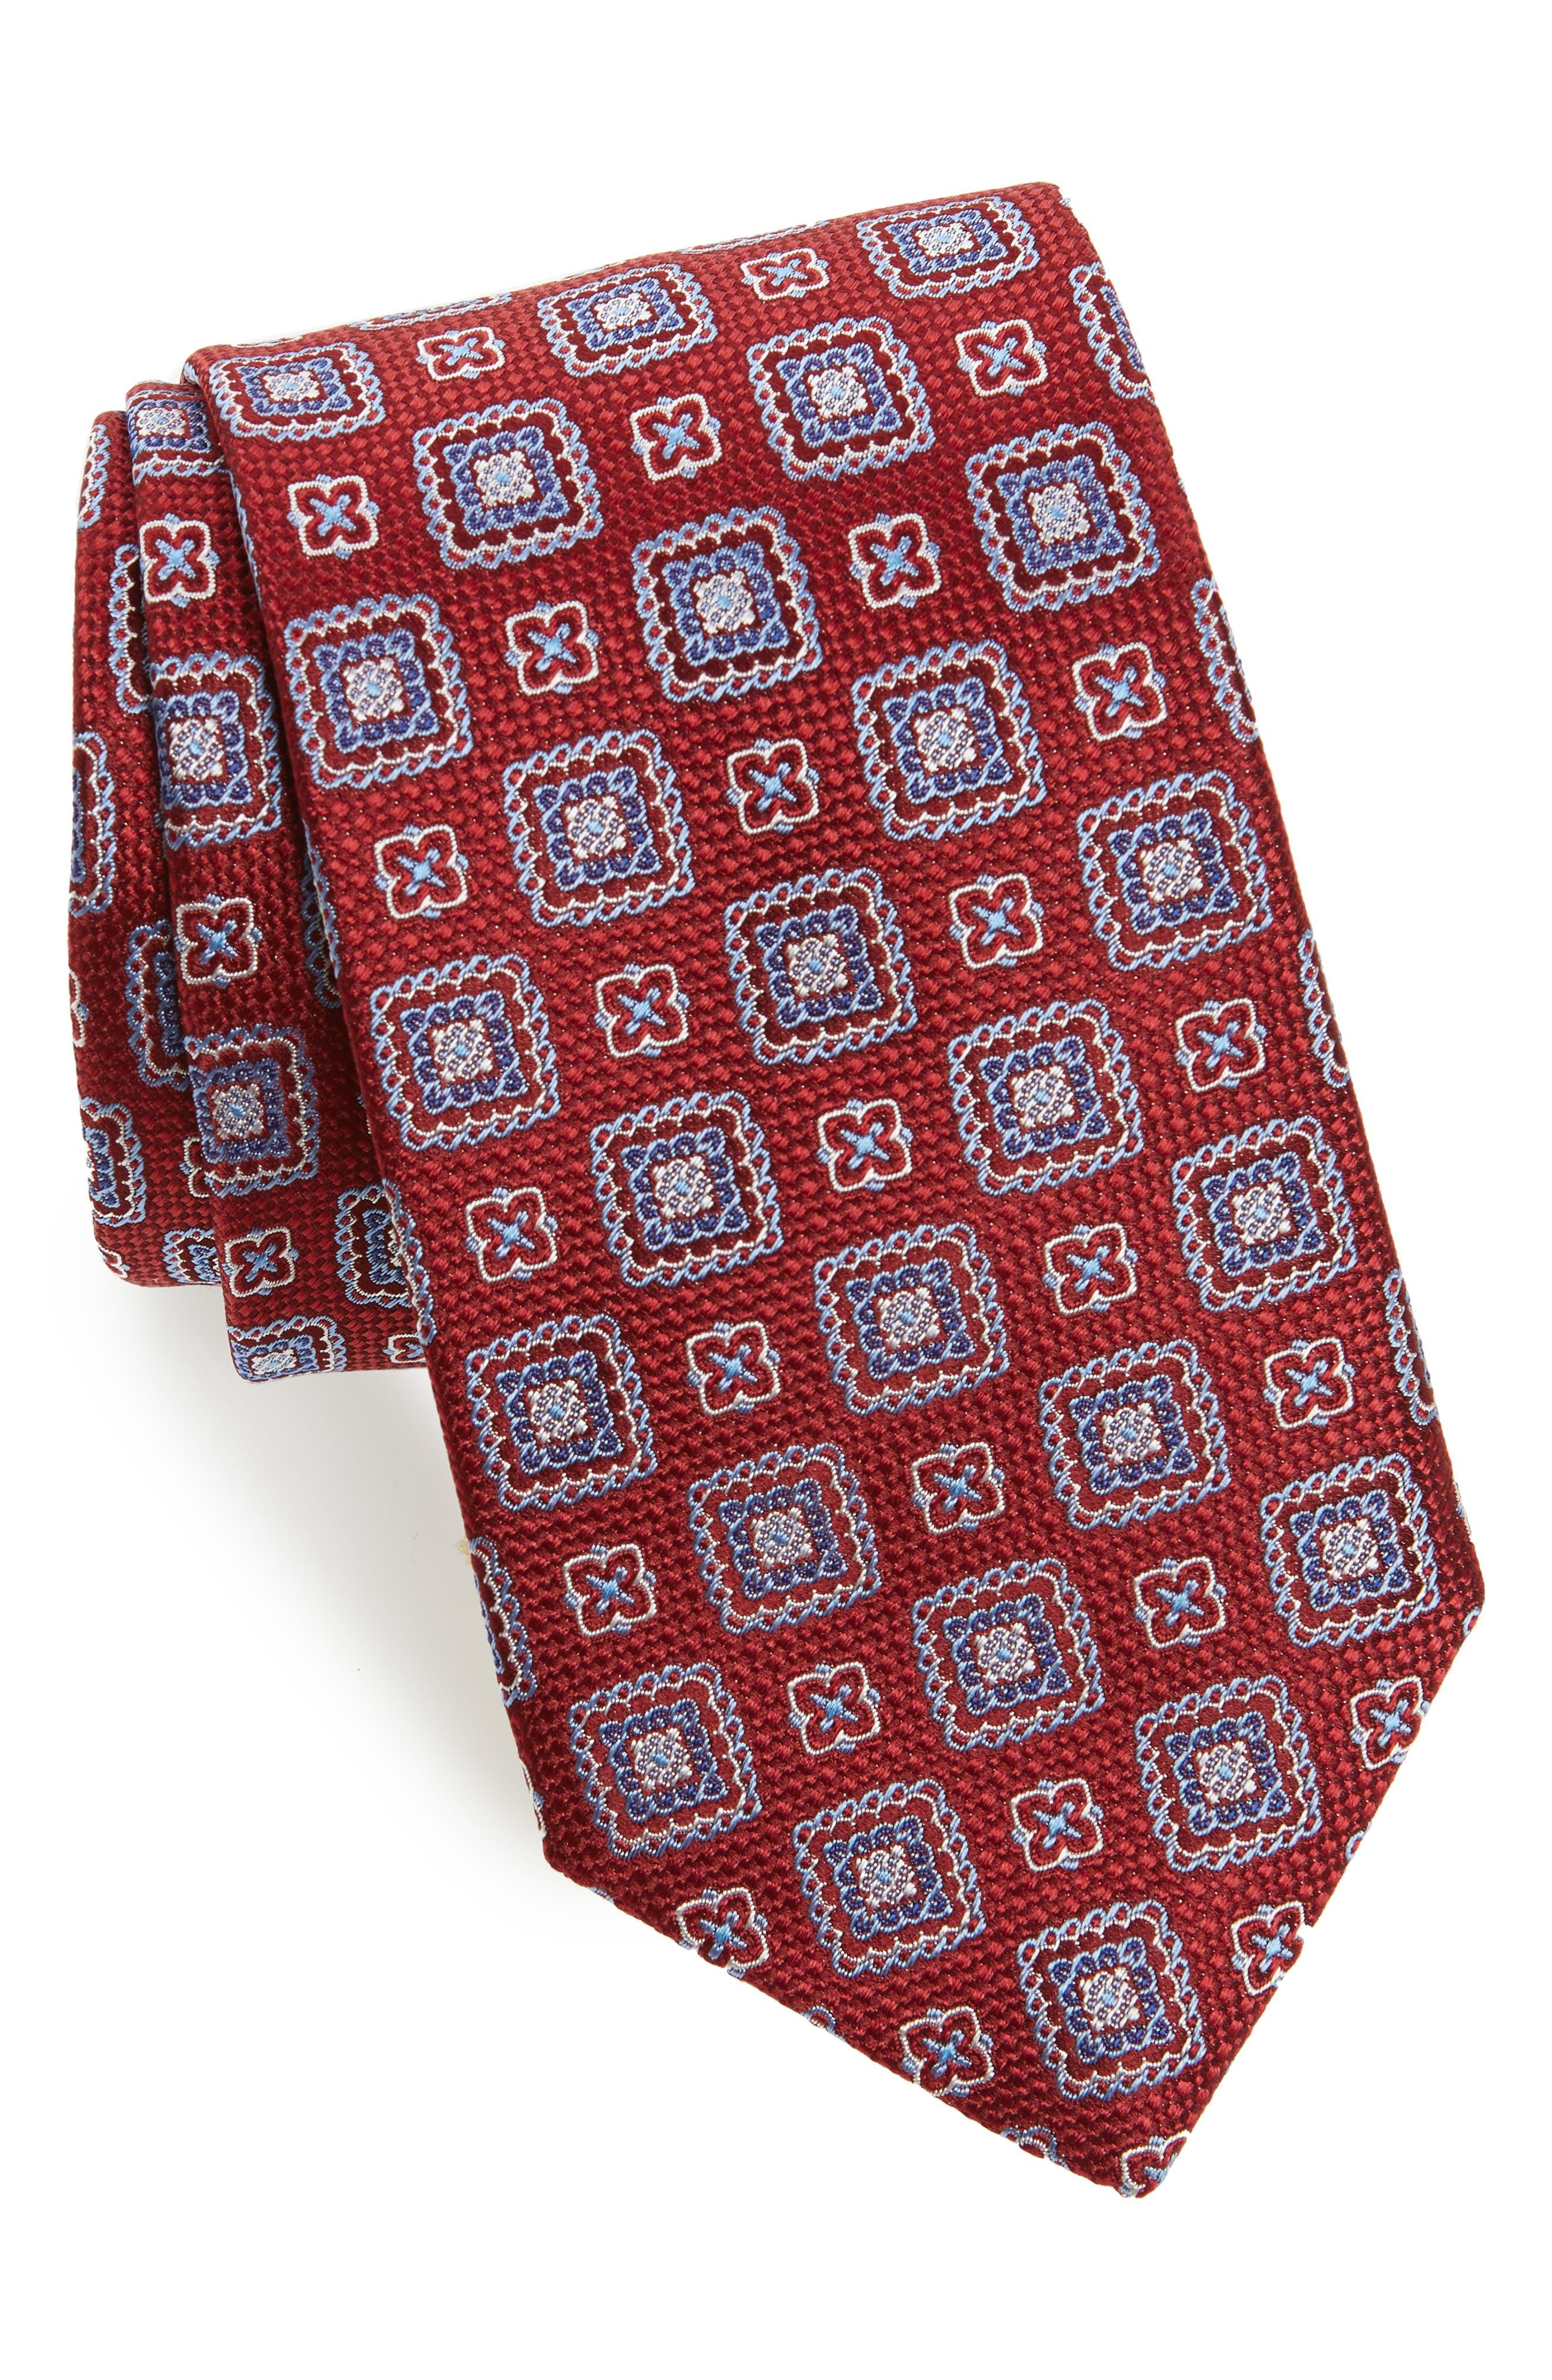 Medallion Silk Tie,                             Main thumbnail 1, color,                             Merlot